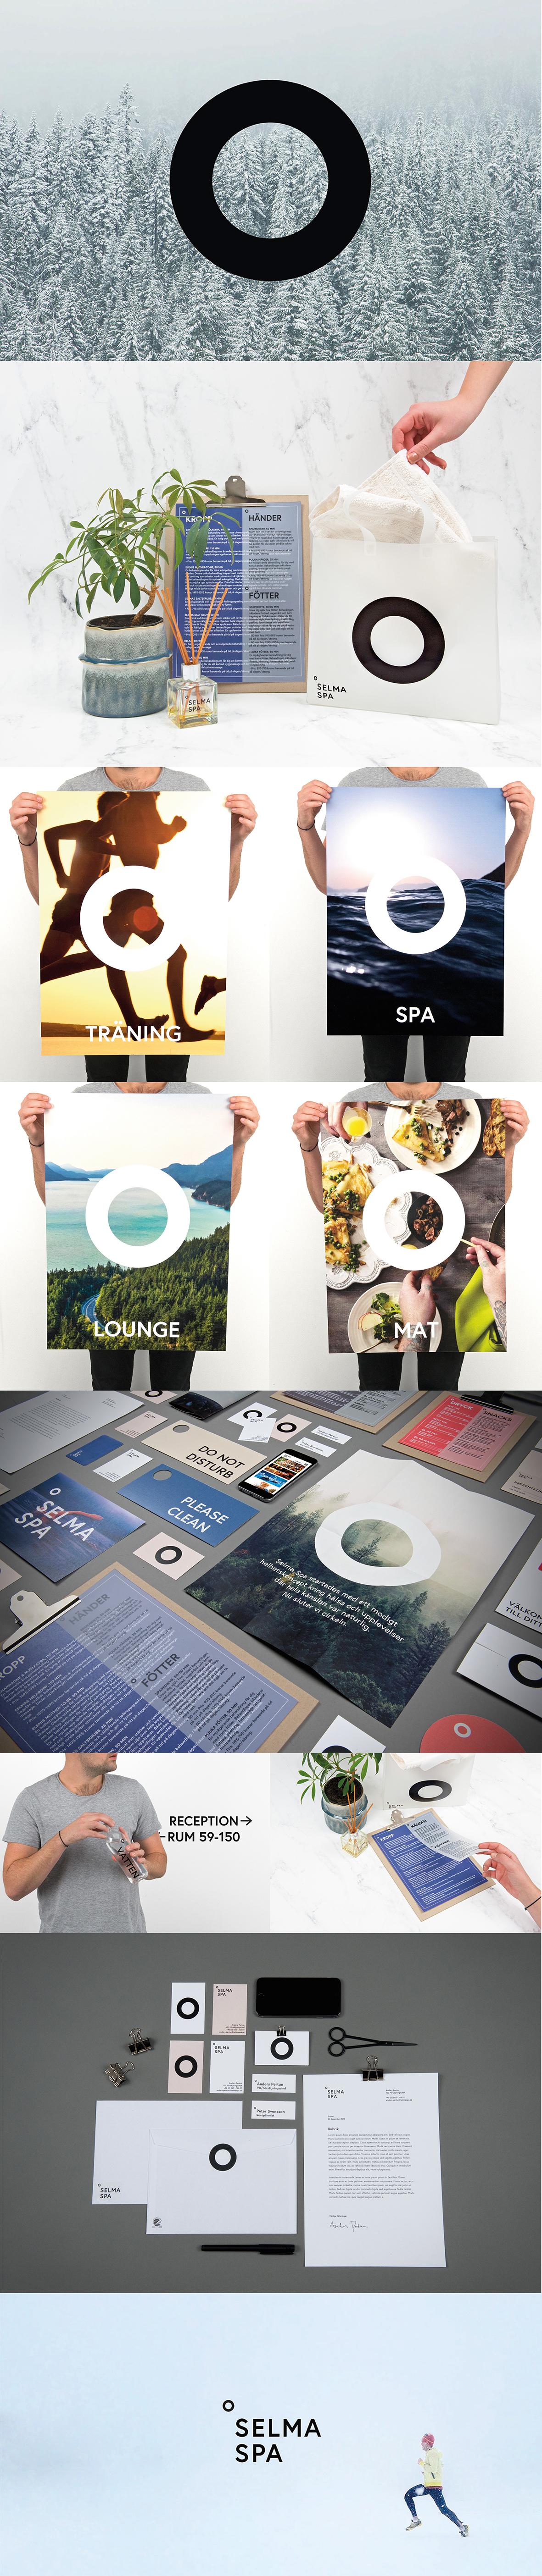 Visual identity for Selma Spa.  https://www.behance.net/gallery/32241747/Selma-Spa-Identity  #spa #hotel #branding #identity #graphicdesign #design